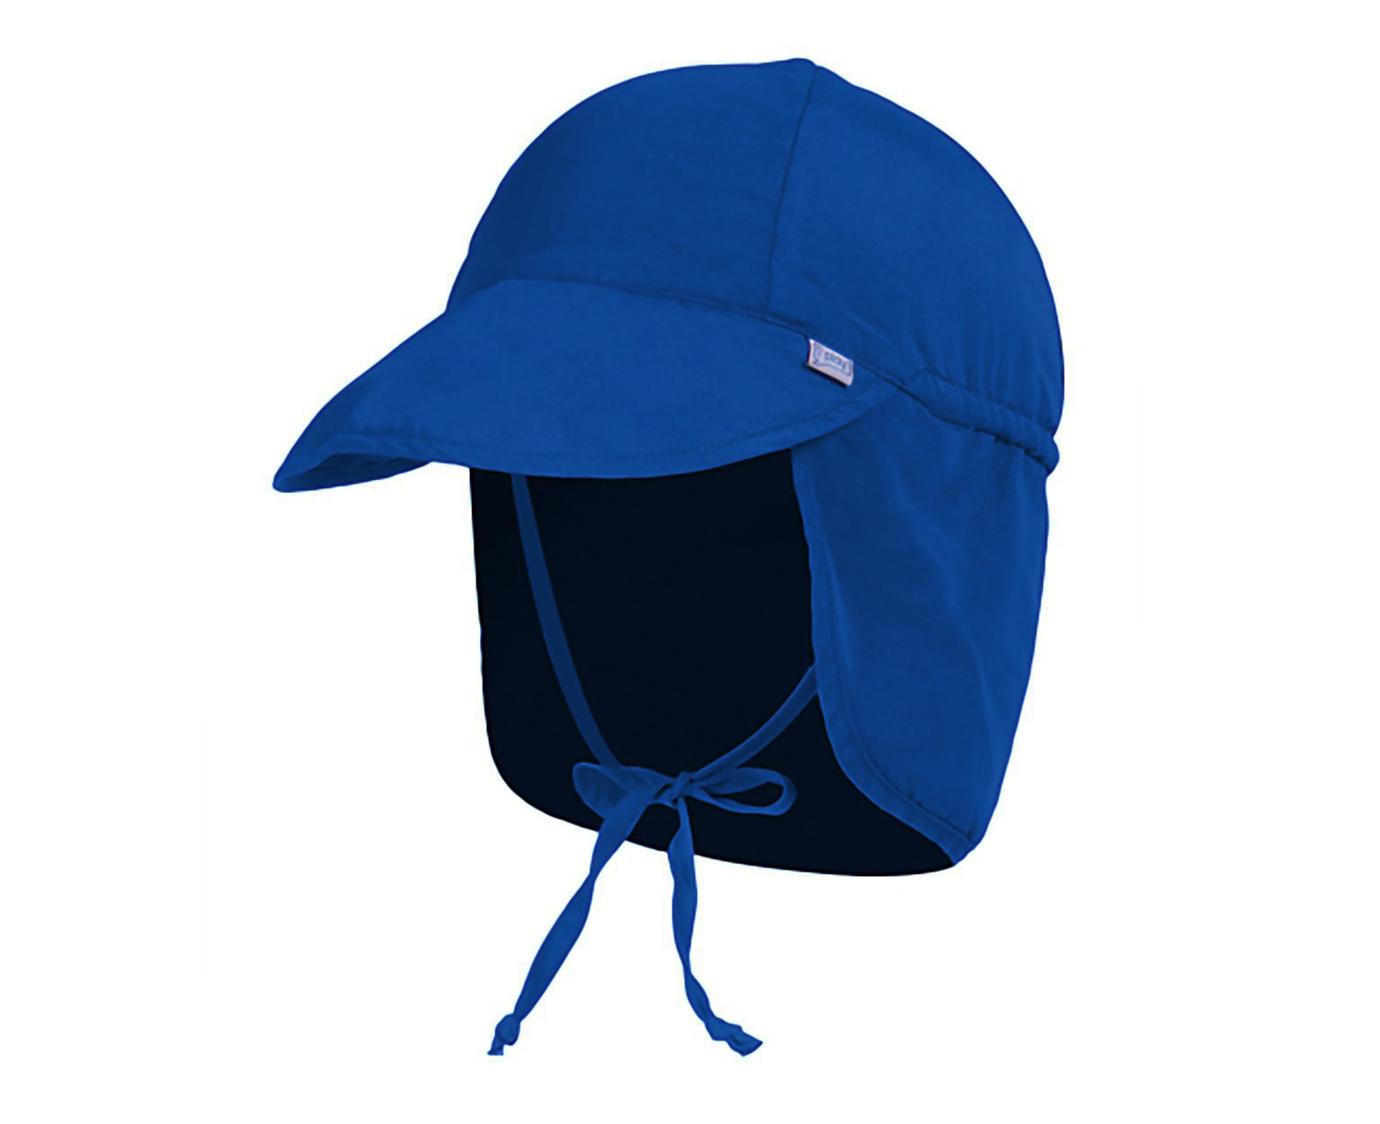 Zonnepetje 'Flap Royal blue'